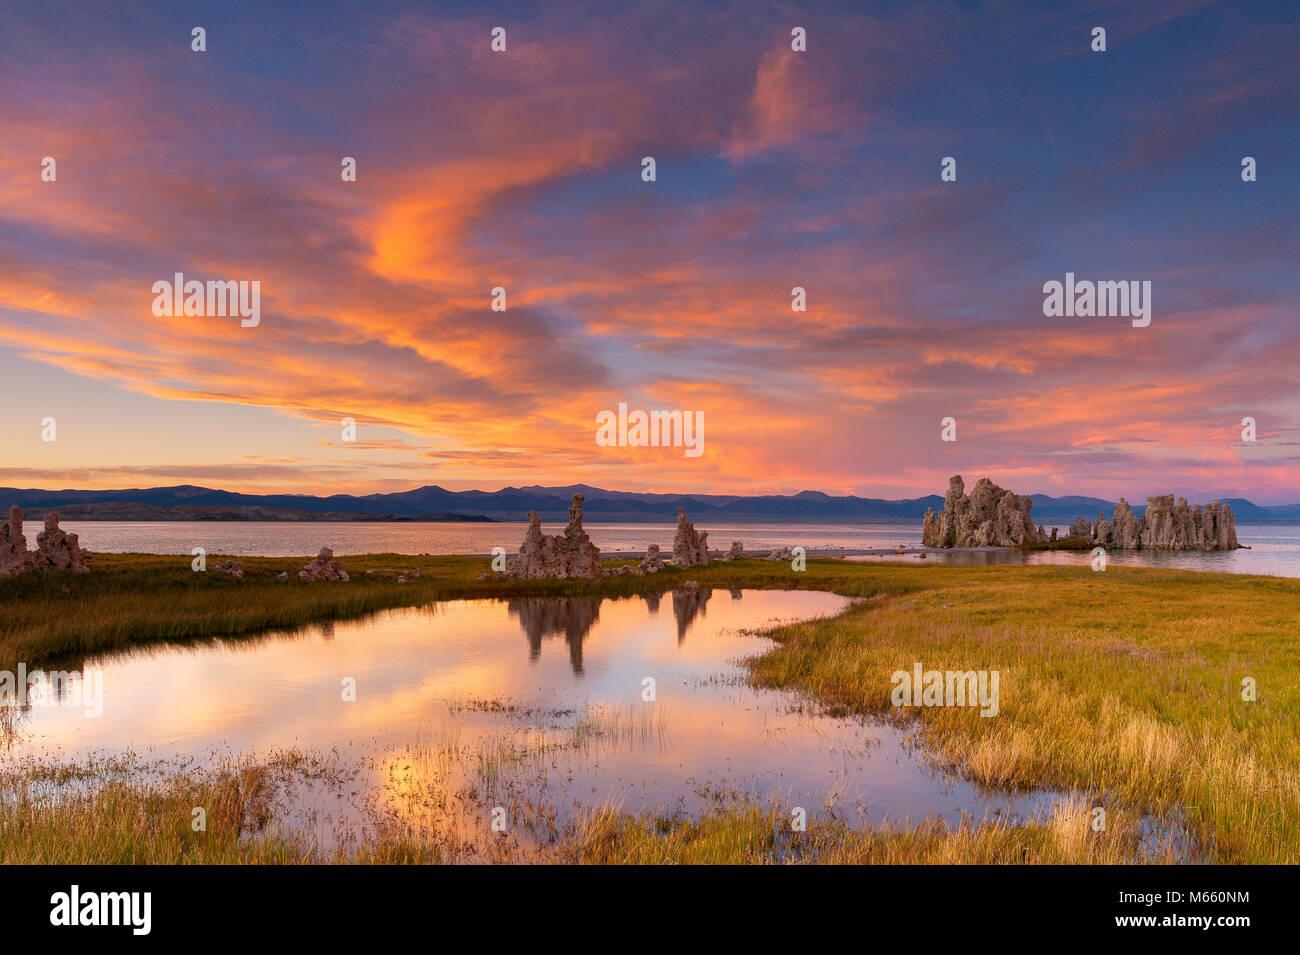 Sunset, Tufa, Mono Lake, Mono Basin National Forest Scenic Area, Inyo National Forest, California - Stock Image